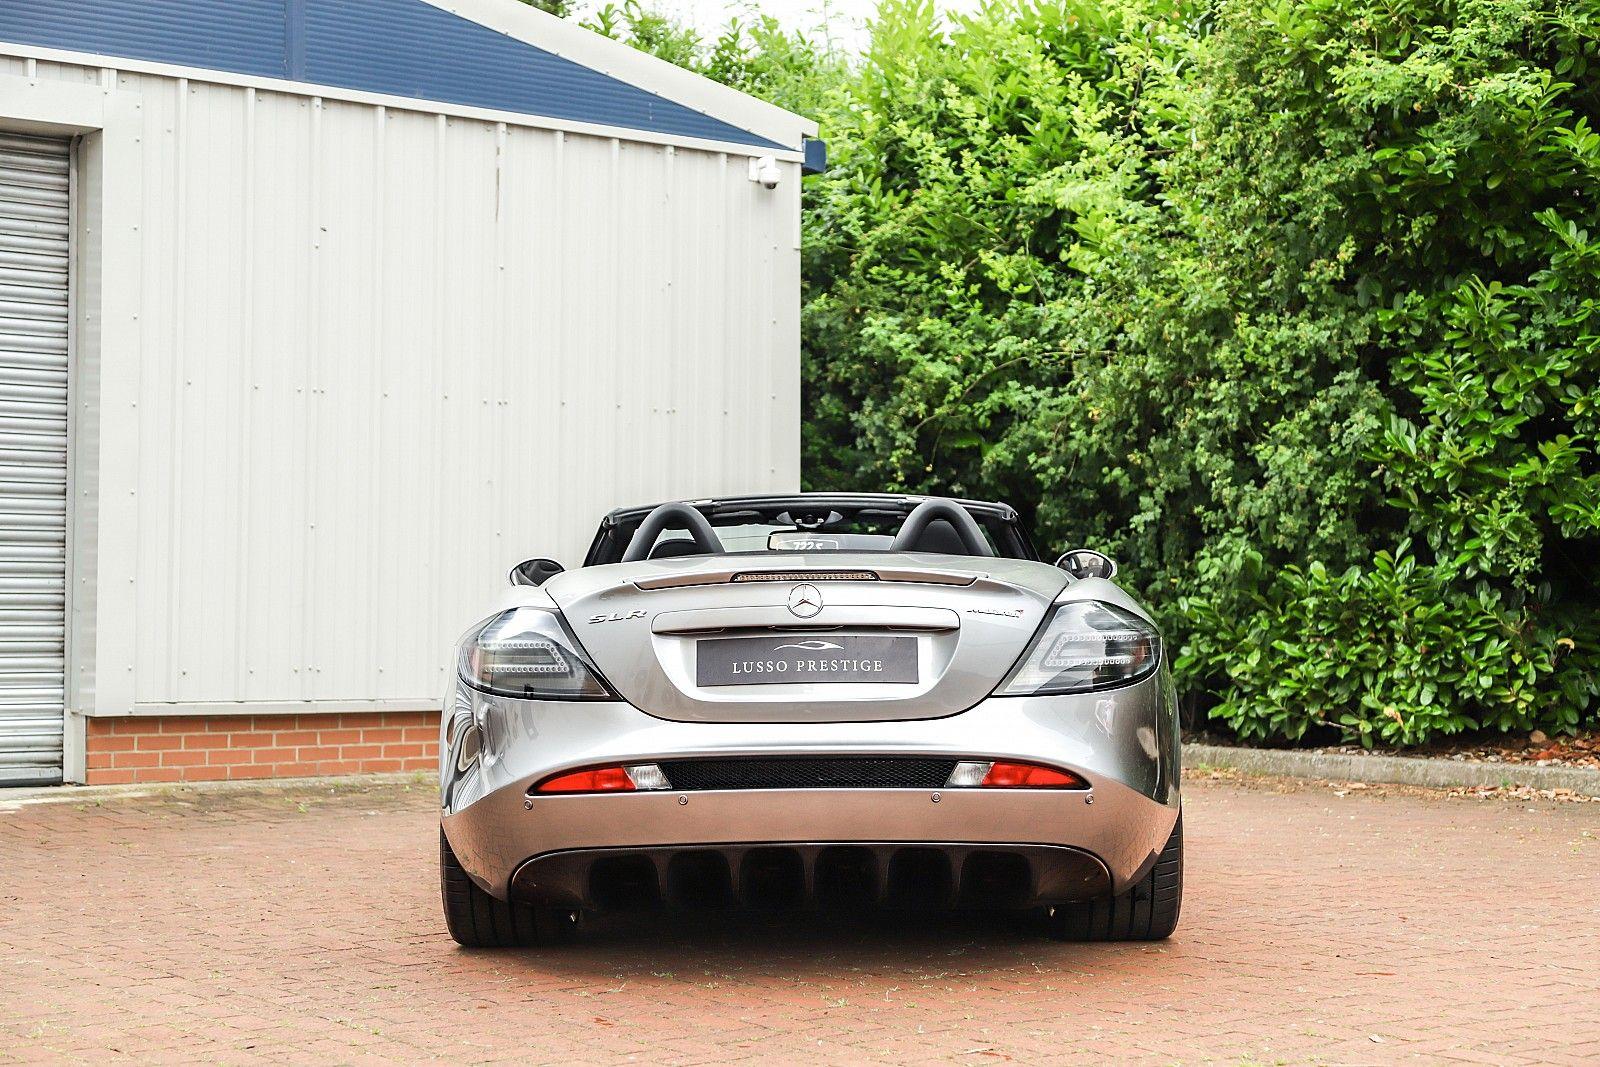 Mercedes Benz Slr 722s Mclaren Lusso Prestige Ltd United